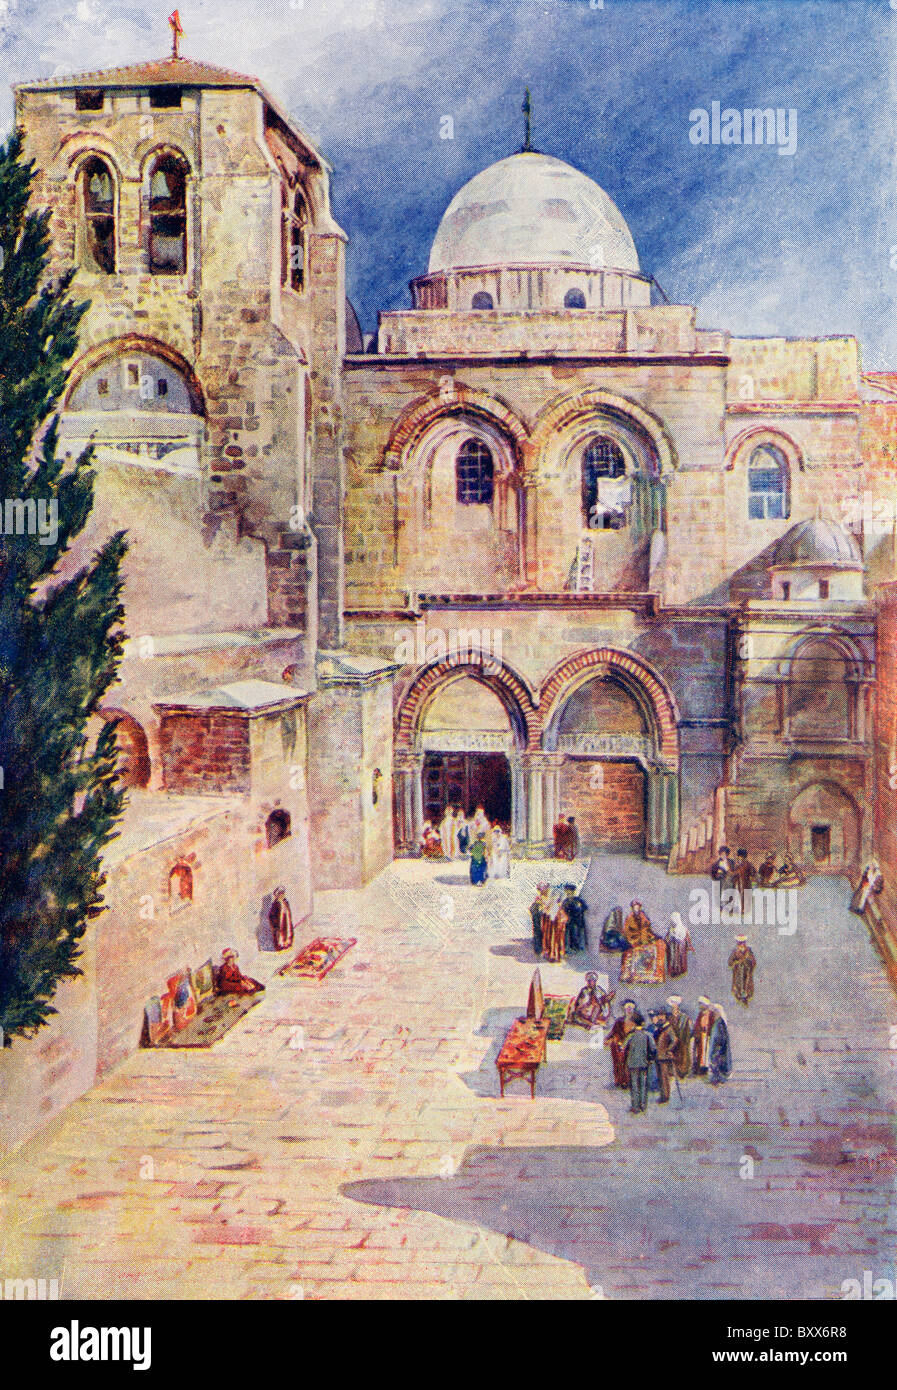 The Church of the Holy Sepulchre, Jerusalem, Palestine, circa 1910. - Stock Image